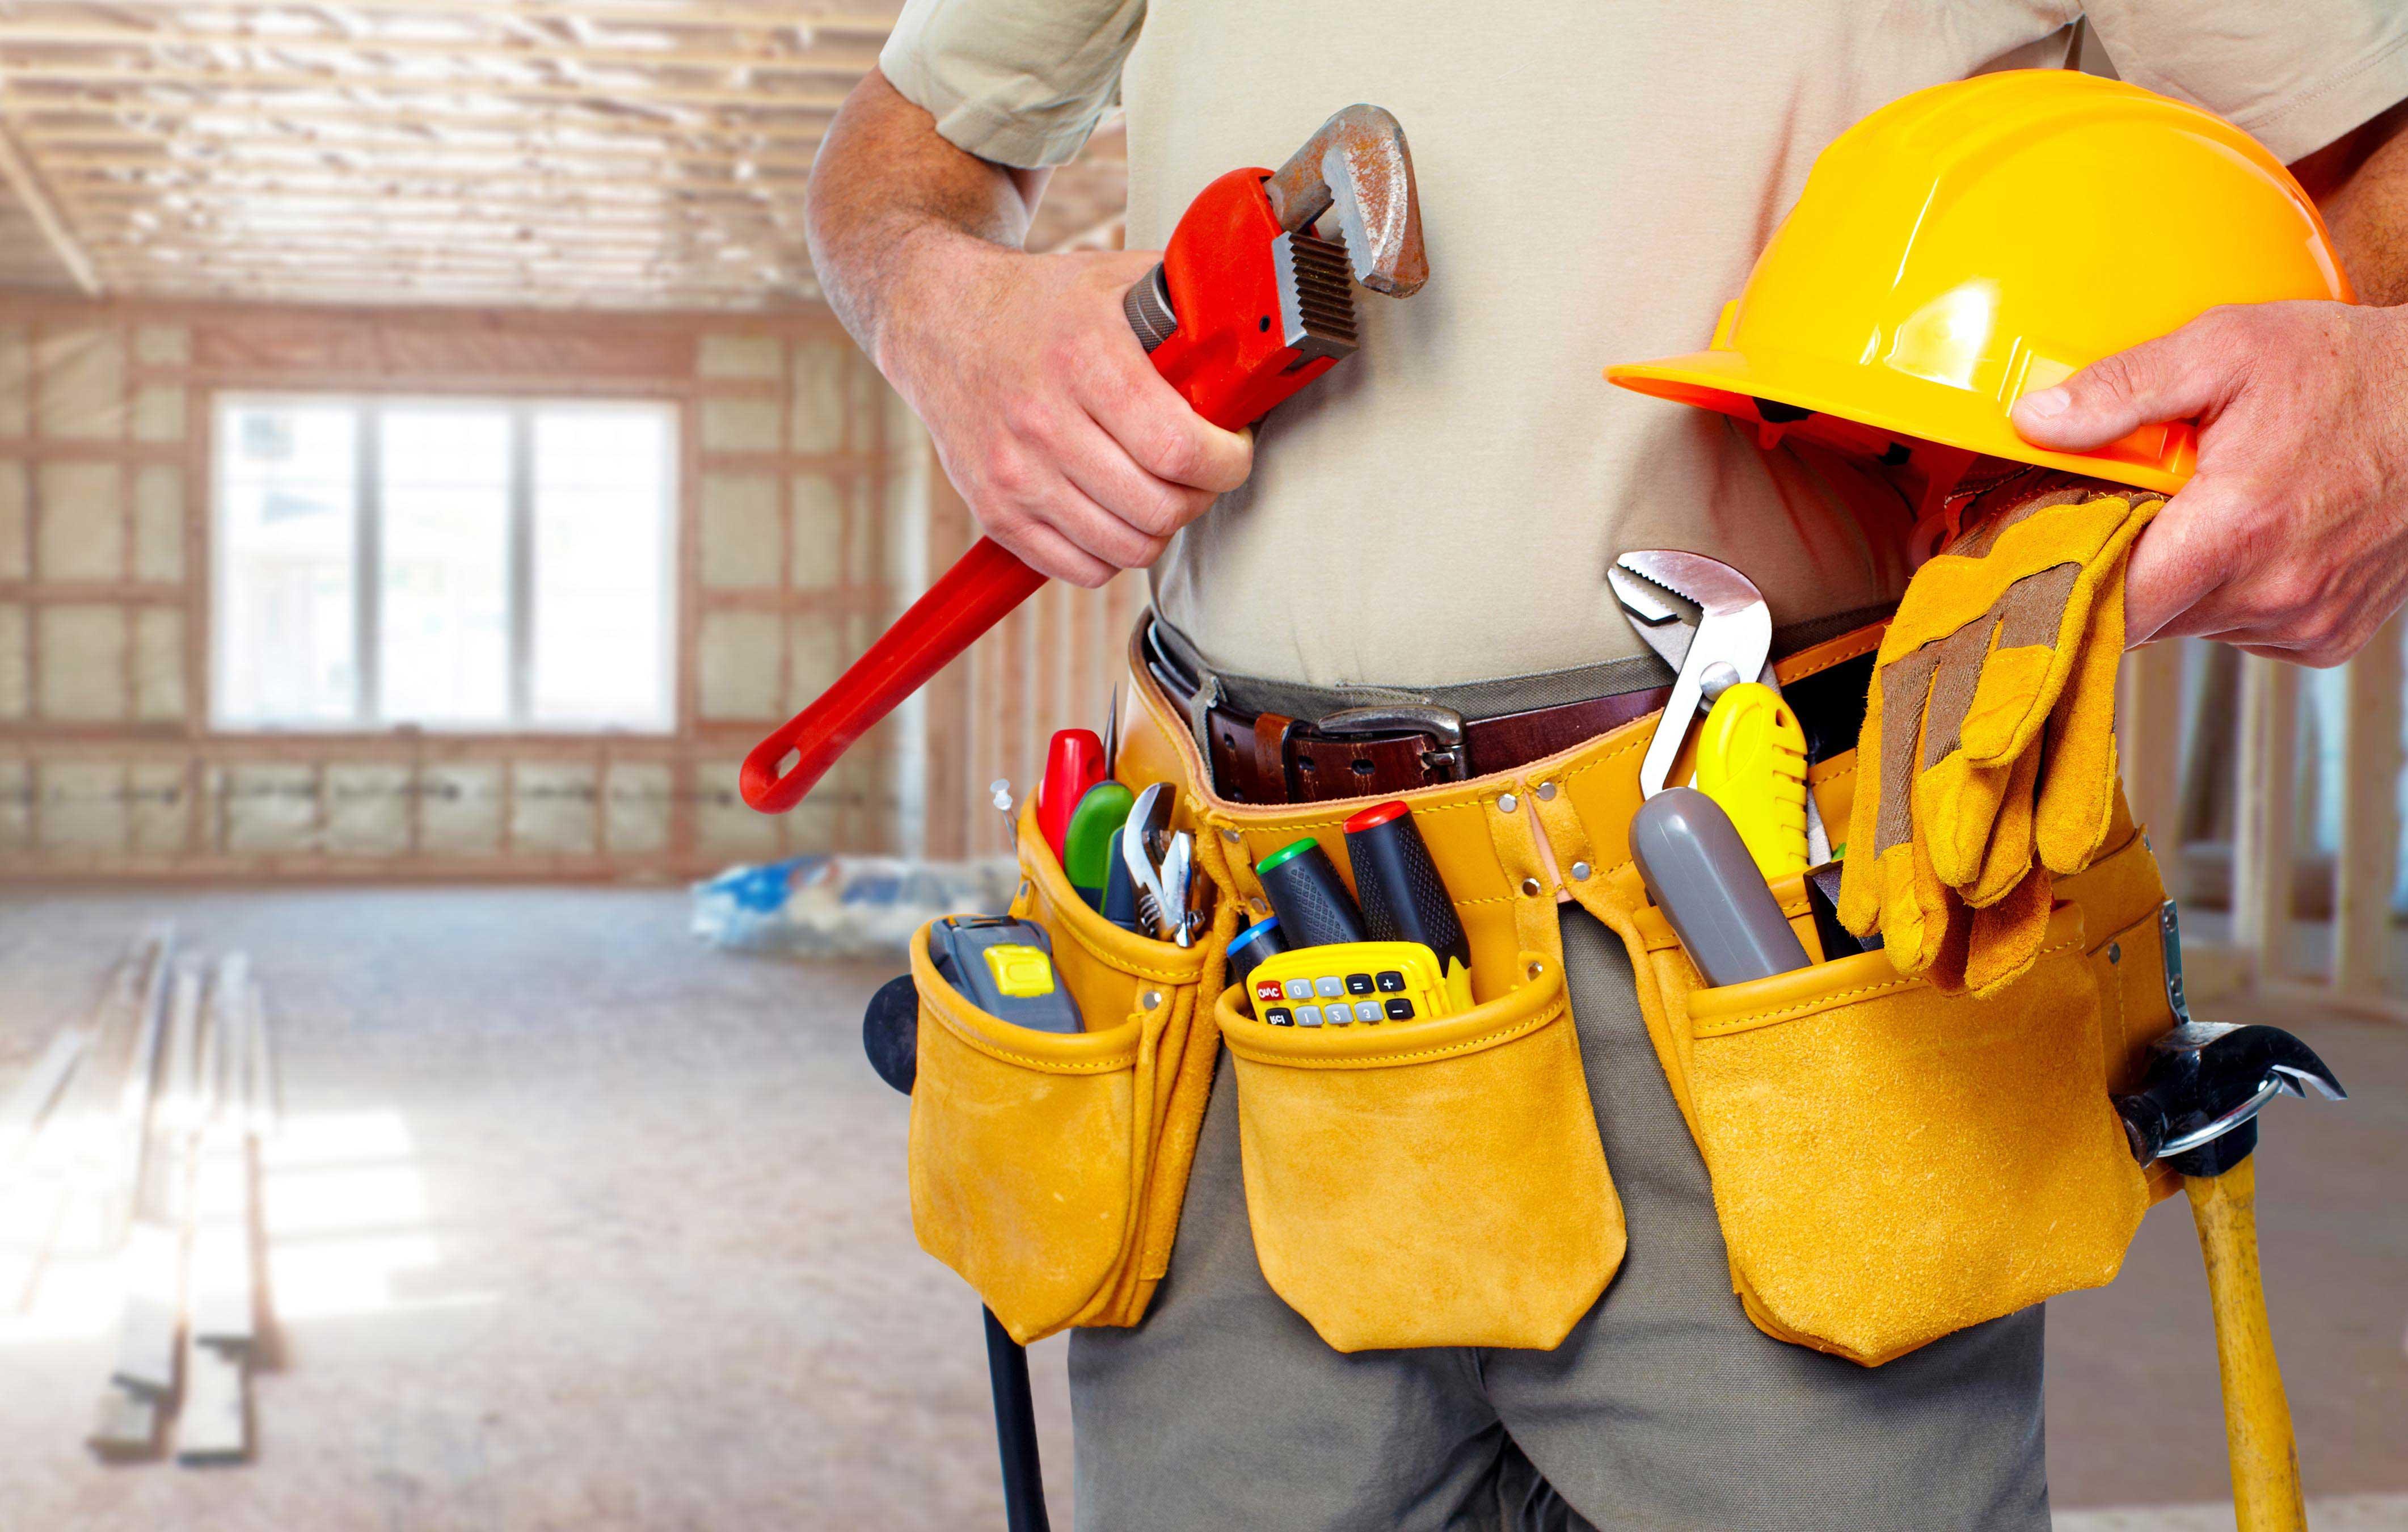 Tool Belt - DIY Safety